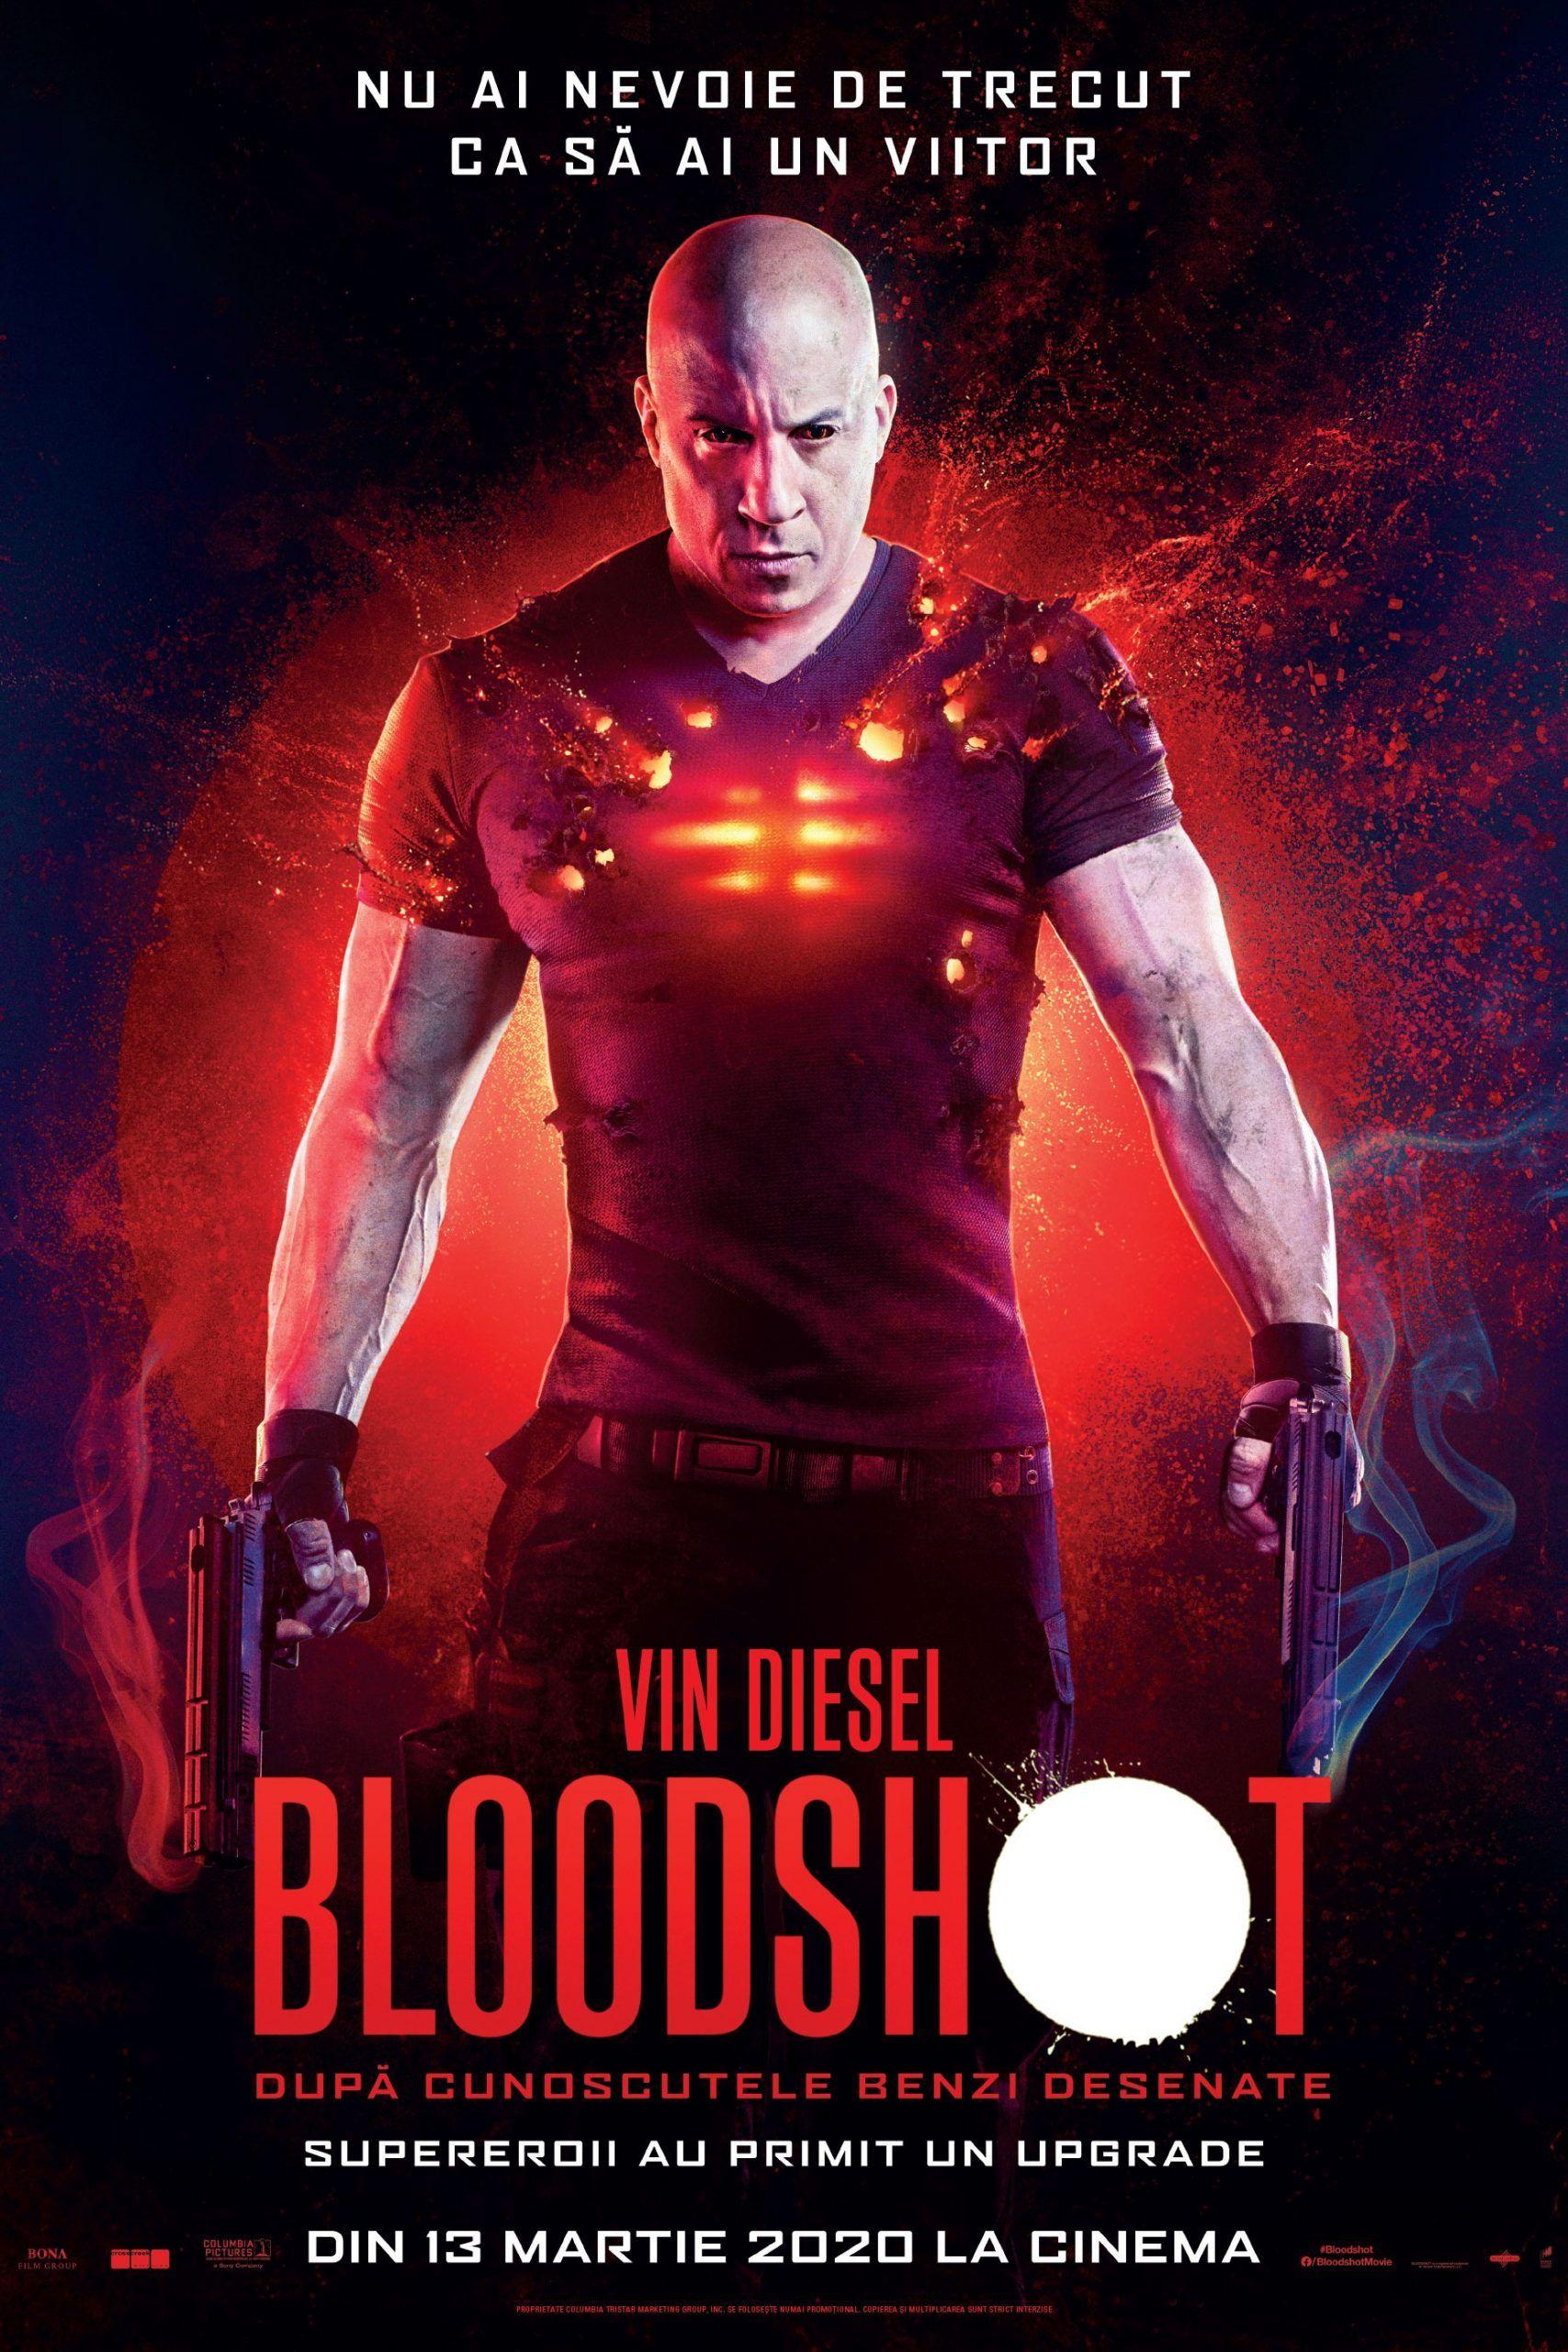 Bloodshot 2020 Film Online Subtitrat In Romana Download Movies Full Movies Online Free Bloodshot Film